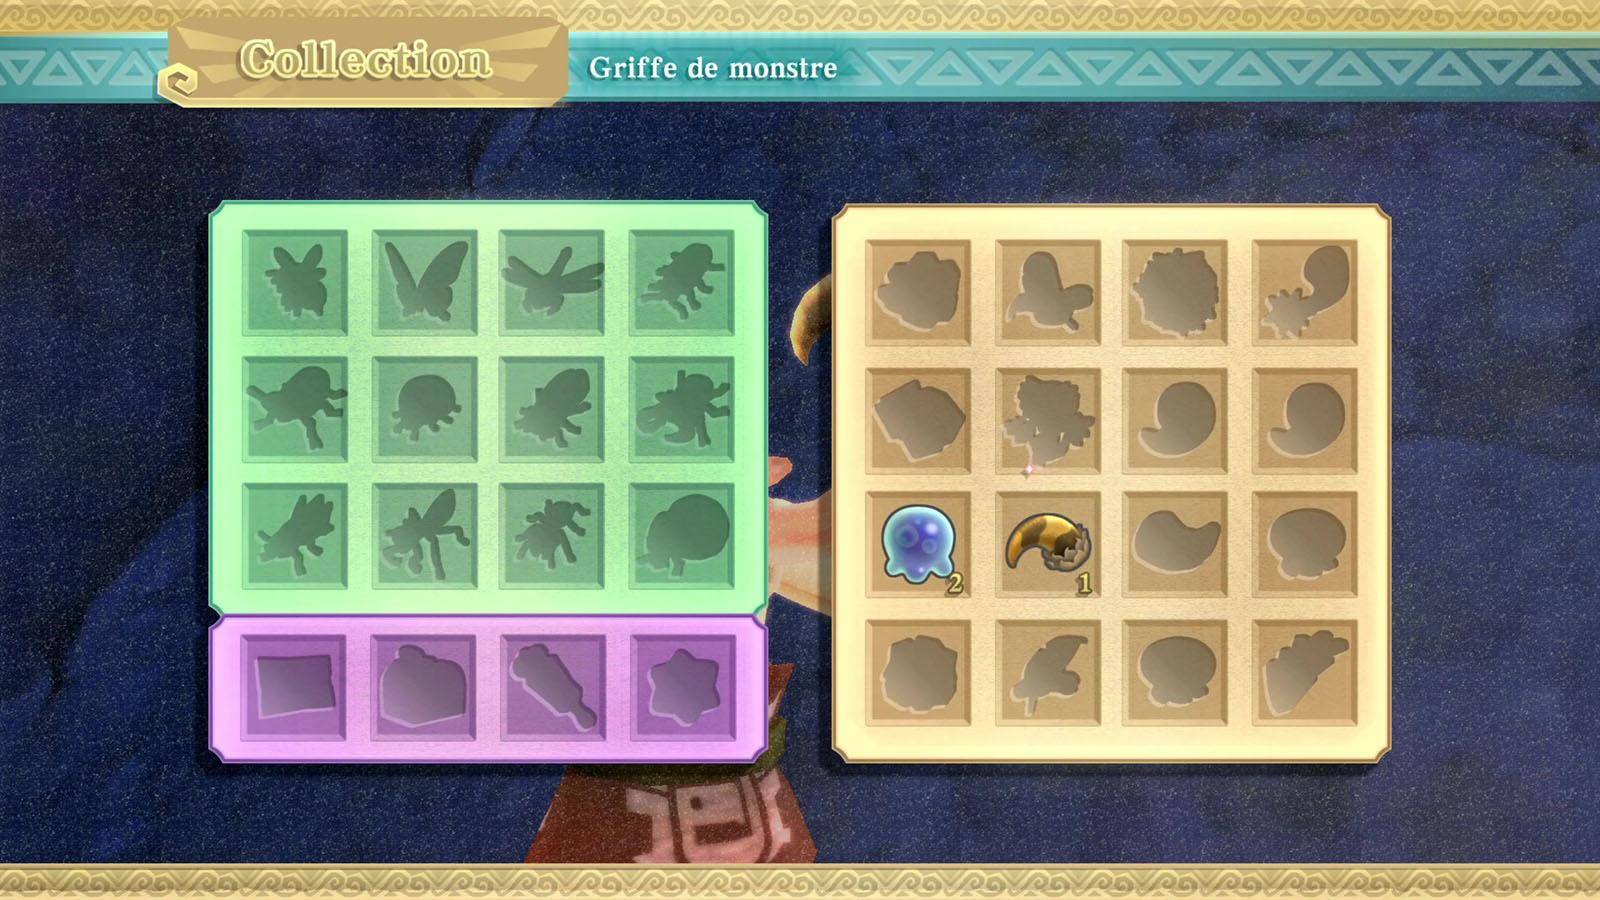 Guide des trésors dans The Legend of Zelda: Skyward Sword